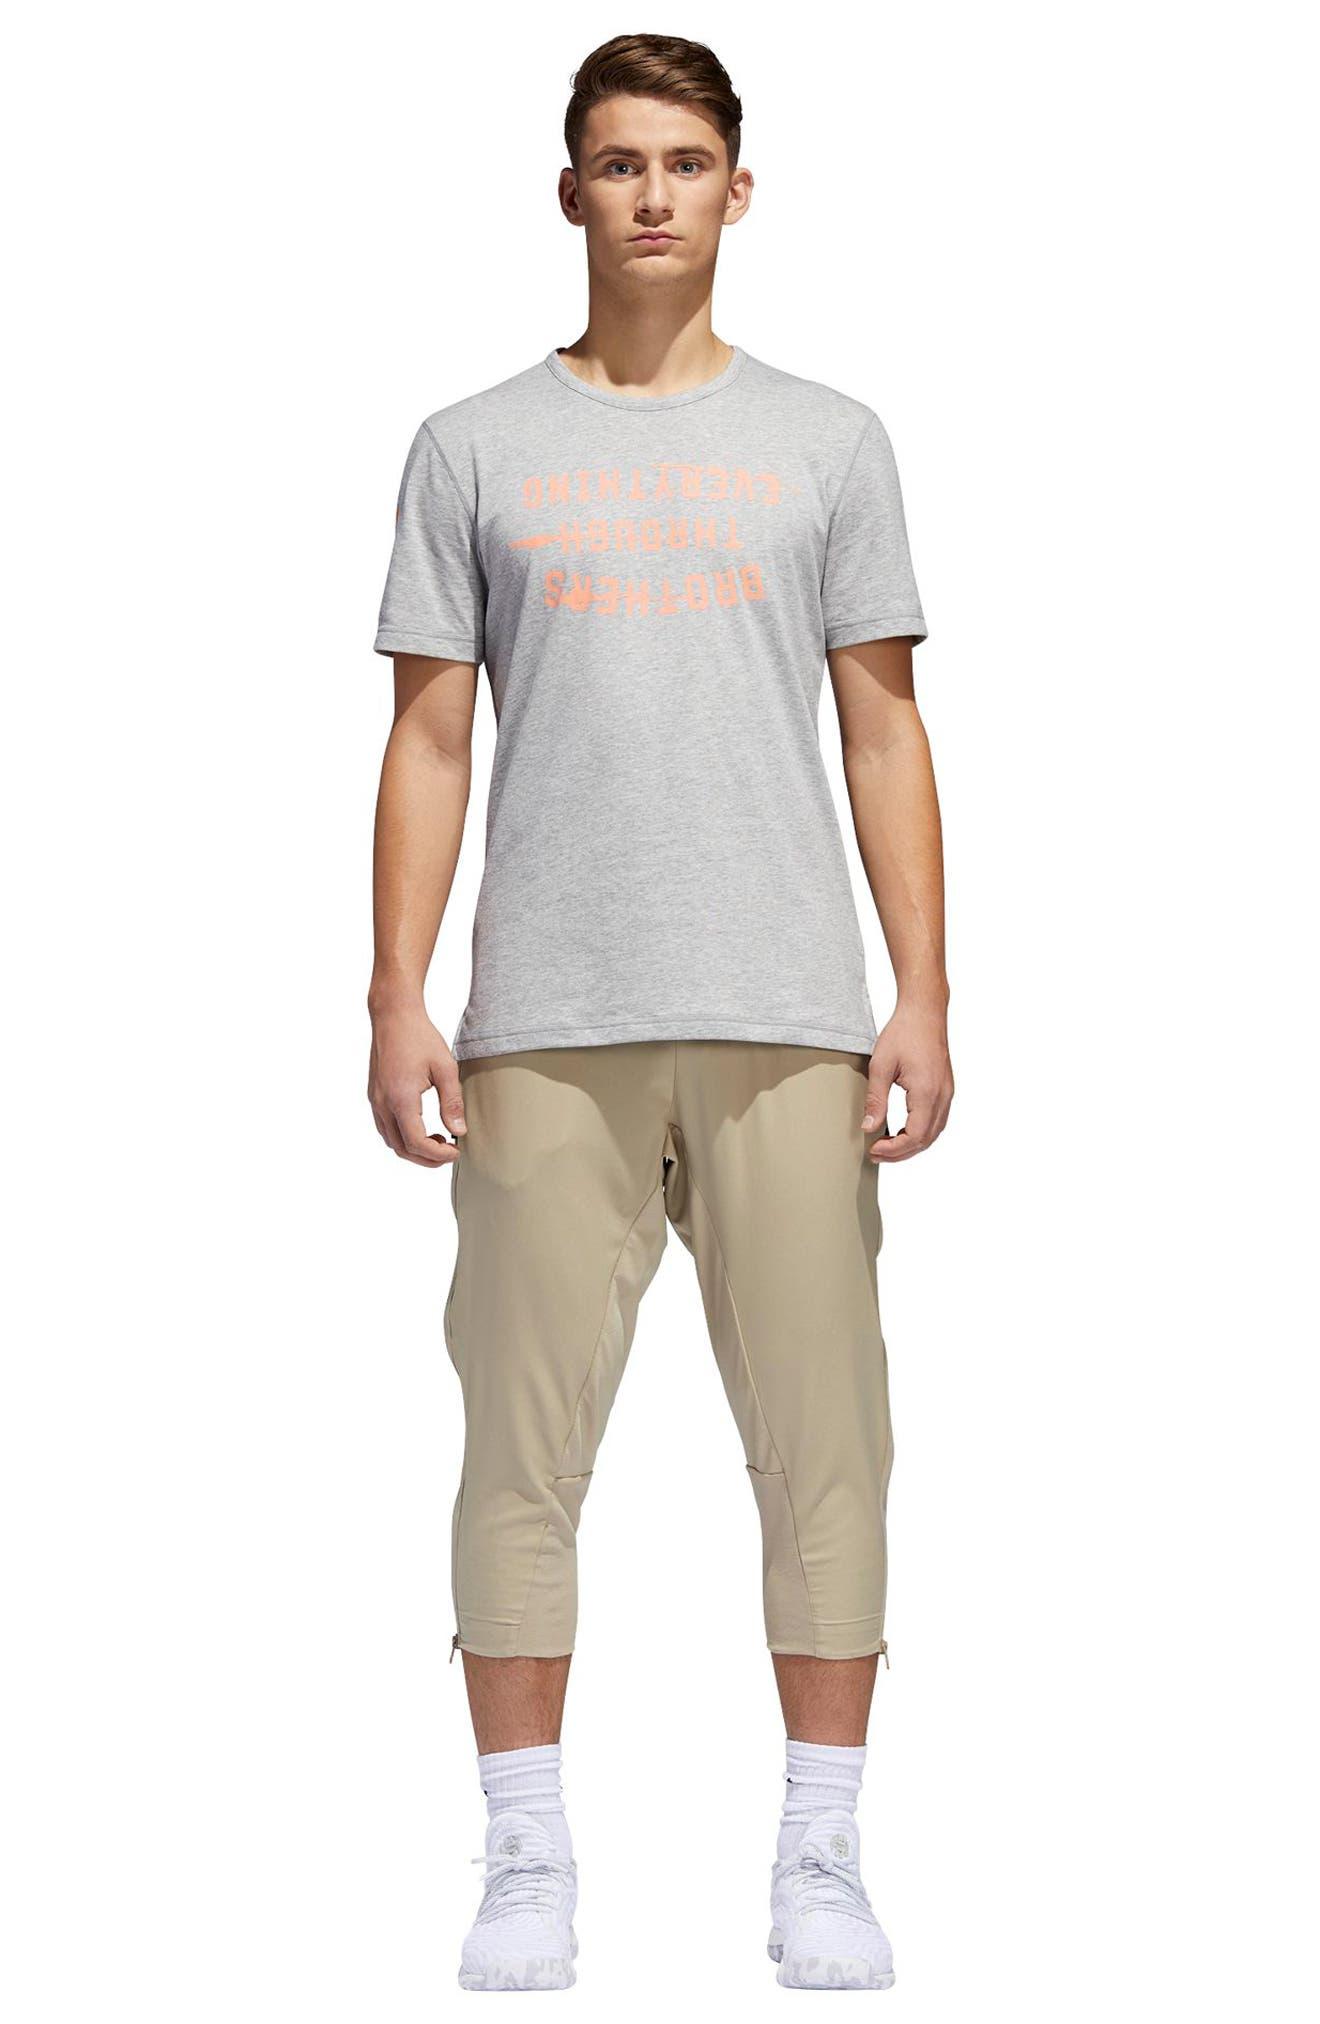 Harden Brand Slogan T-Shirt,                             Alternate thumbnail 6, color,